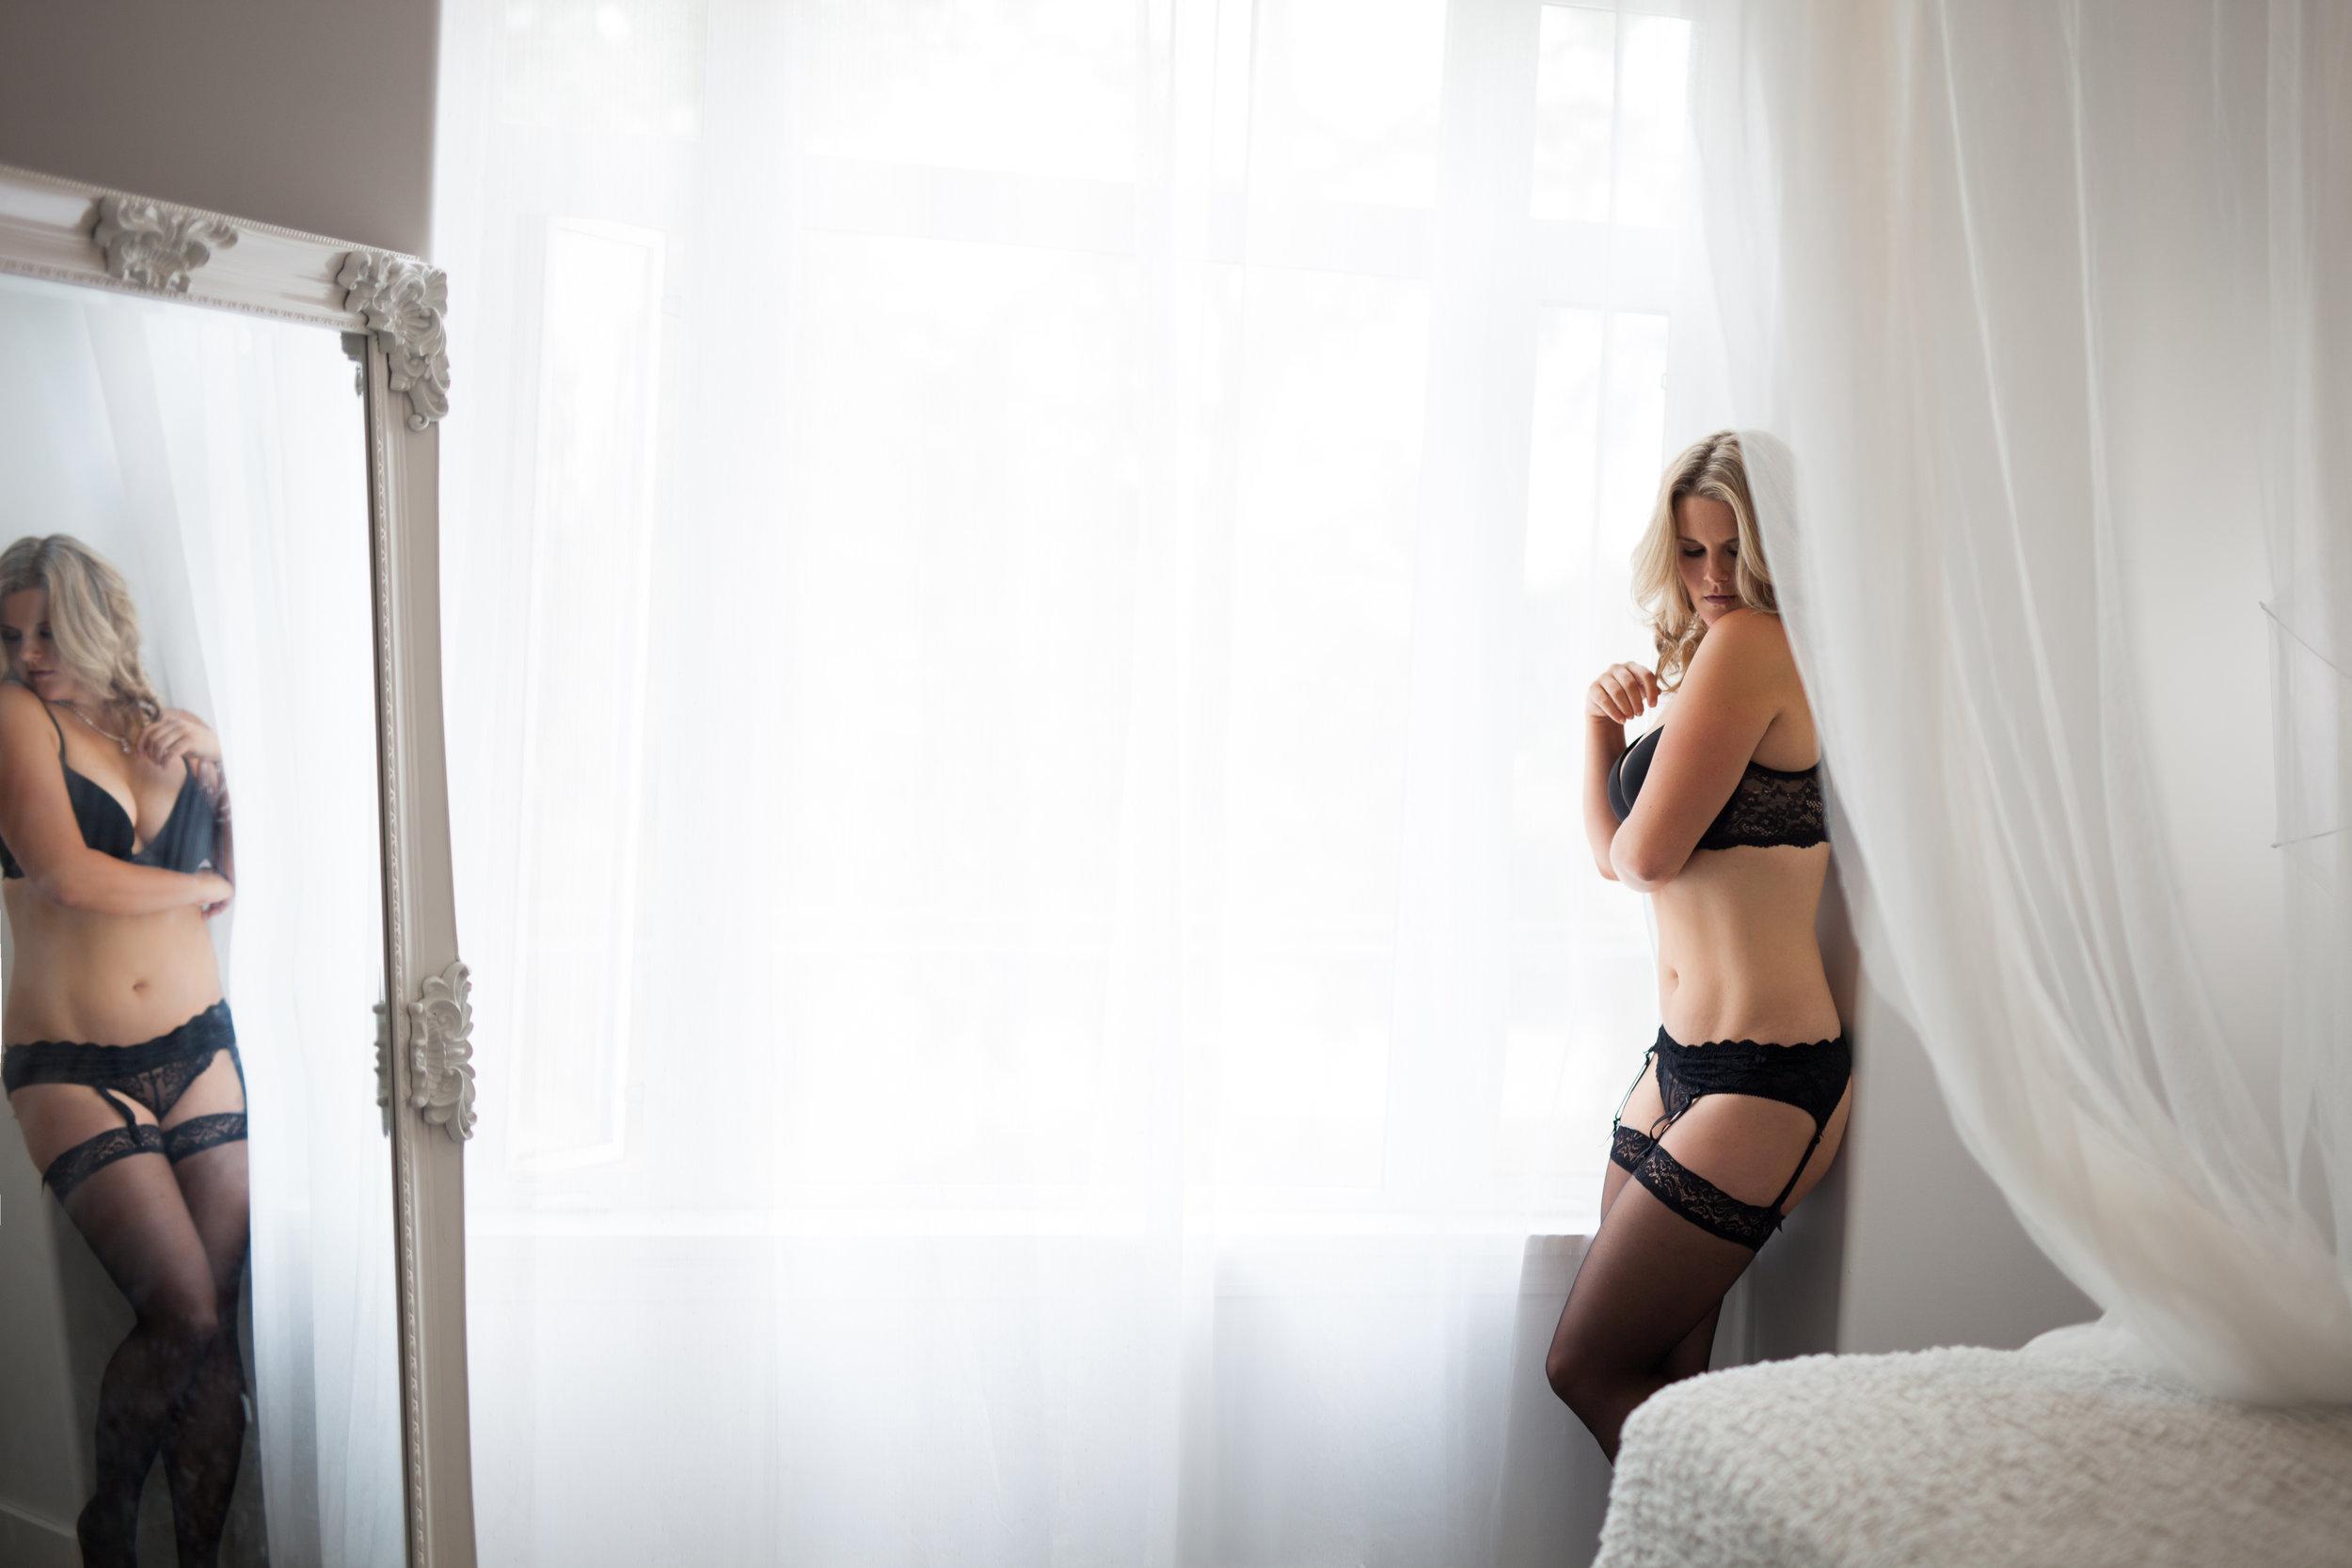 Lilly Ann Photography - Victoria & Vancouver Boudoir Photographer